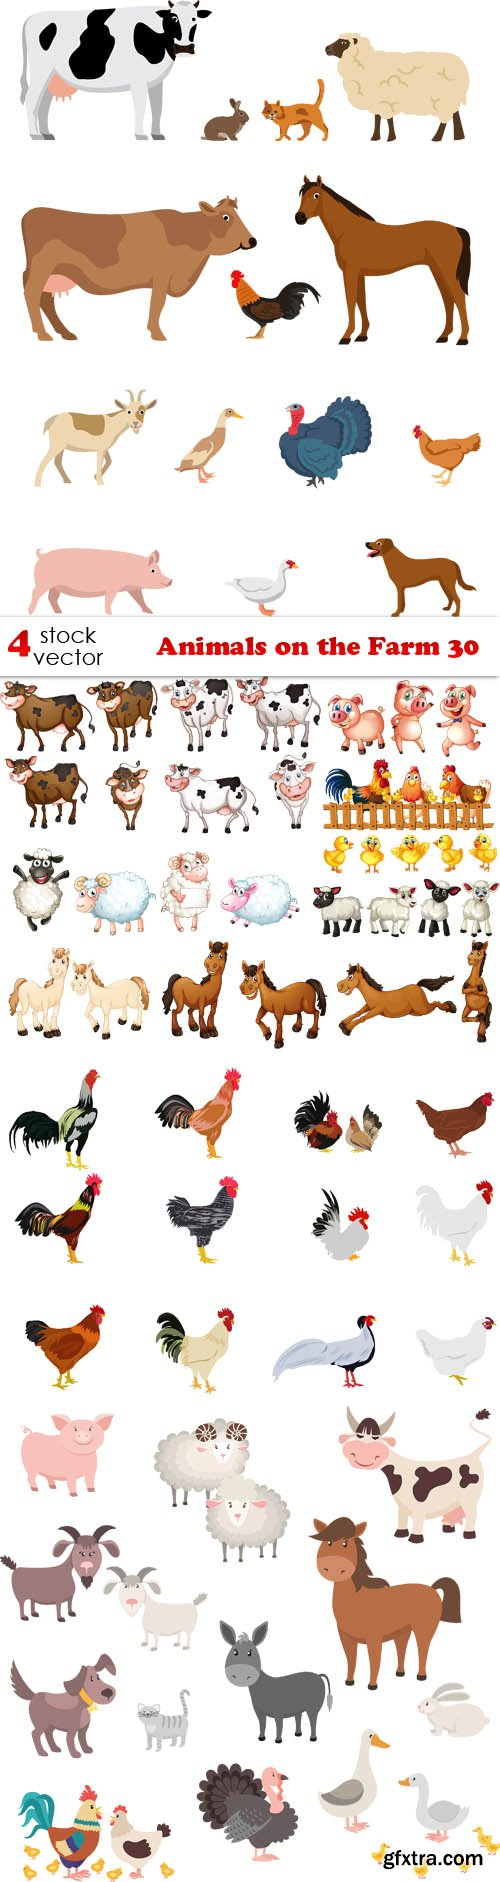 Vectors - Animals on the Farm 30